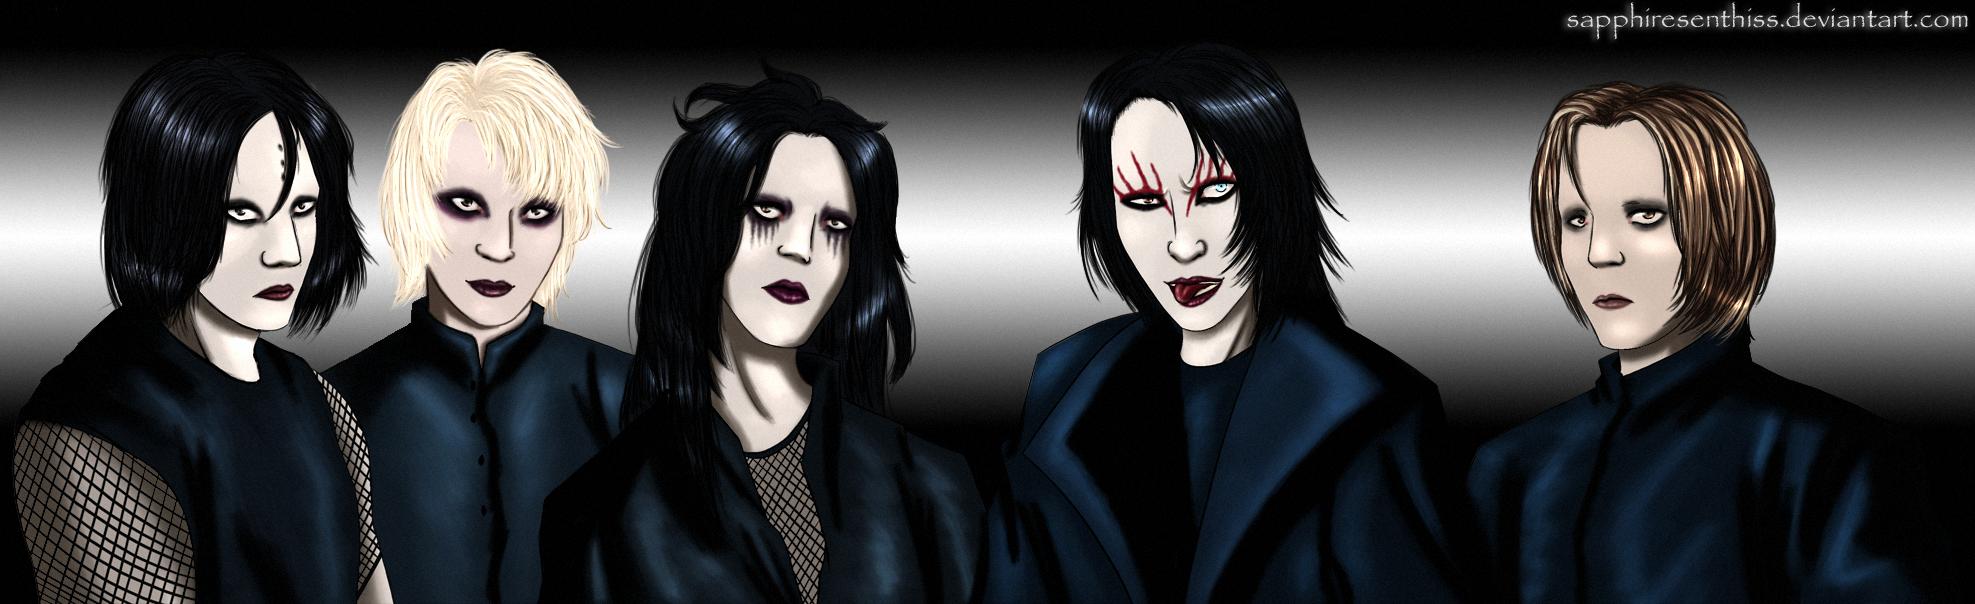 Marilyn Manson S Powder Paint Concert